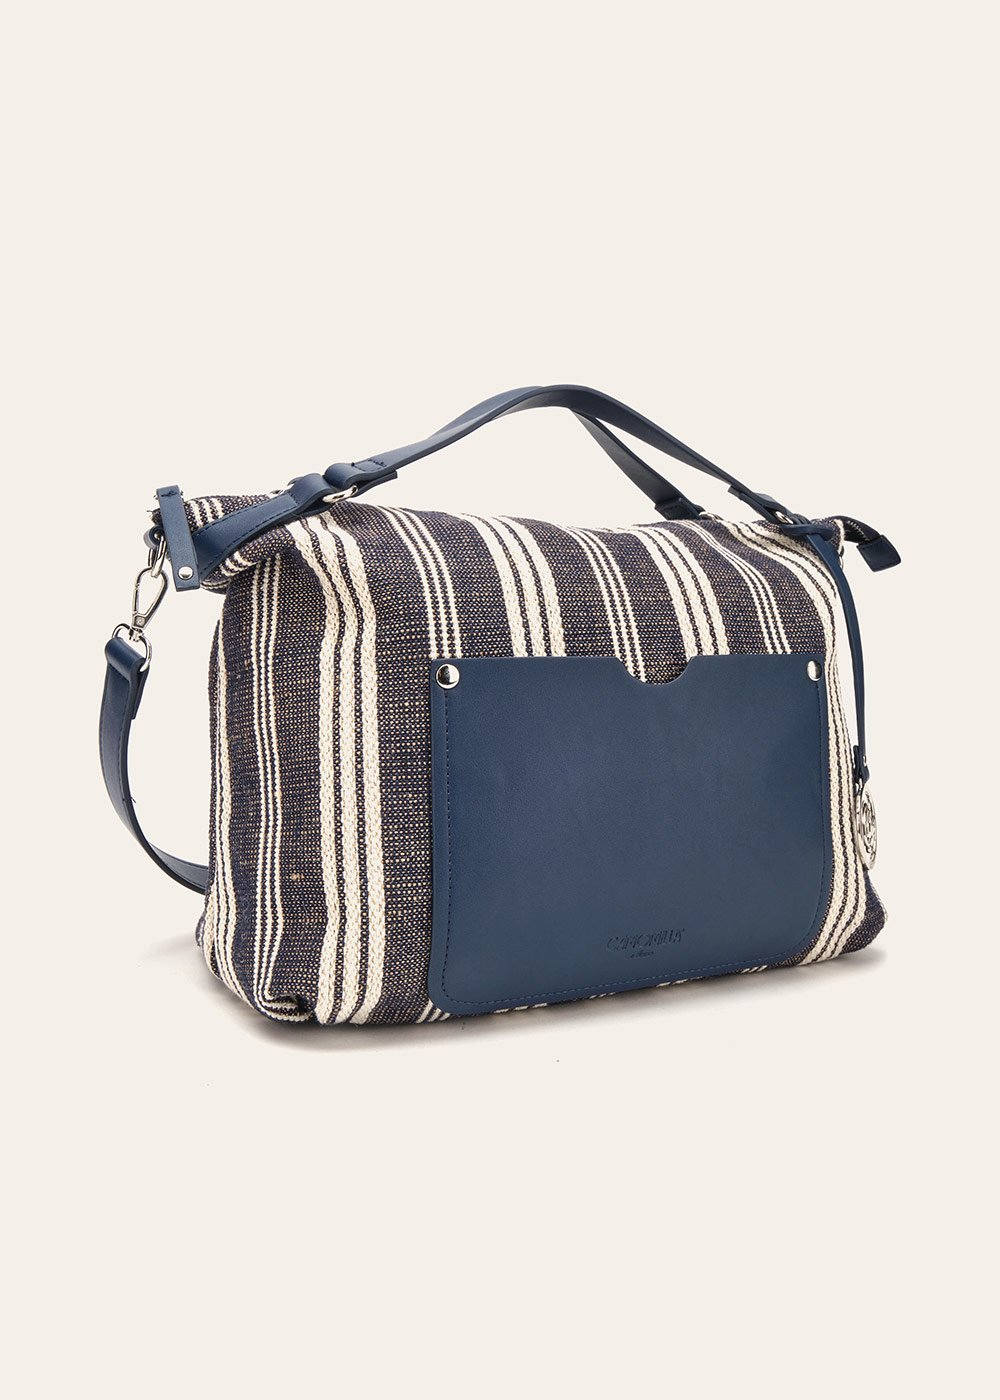 Beryl fabric handbag with faux-leather appliques - Dark Blue Stripes - Woman